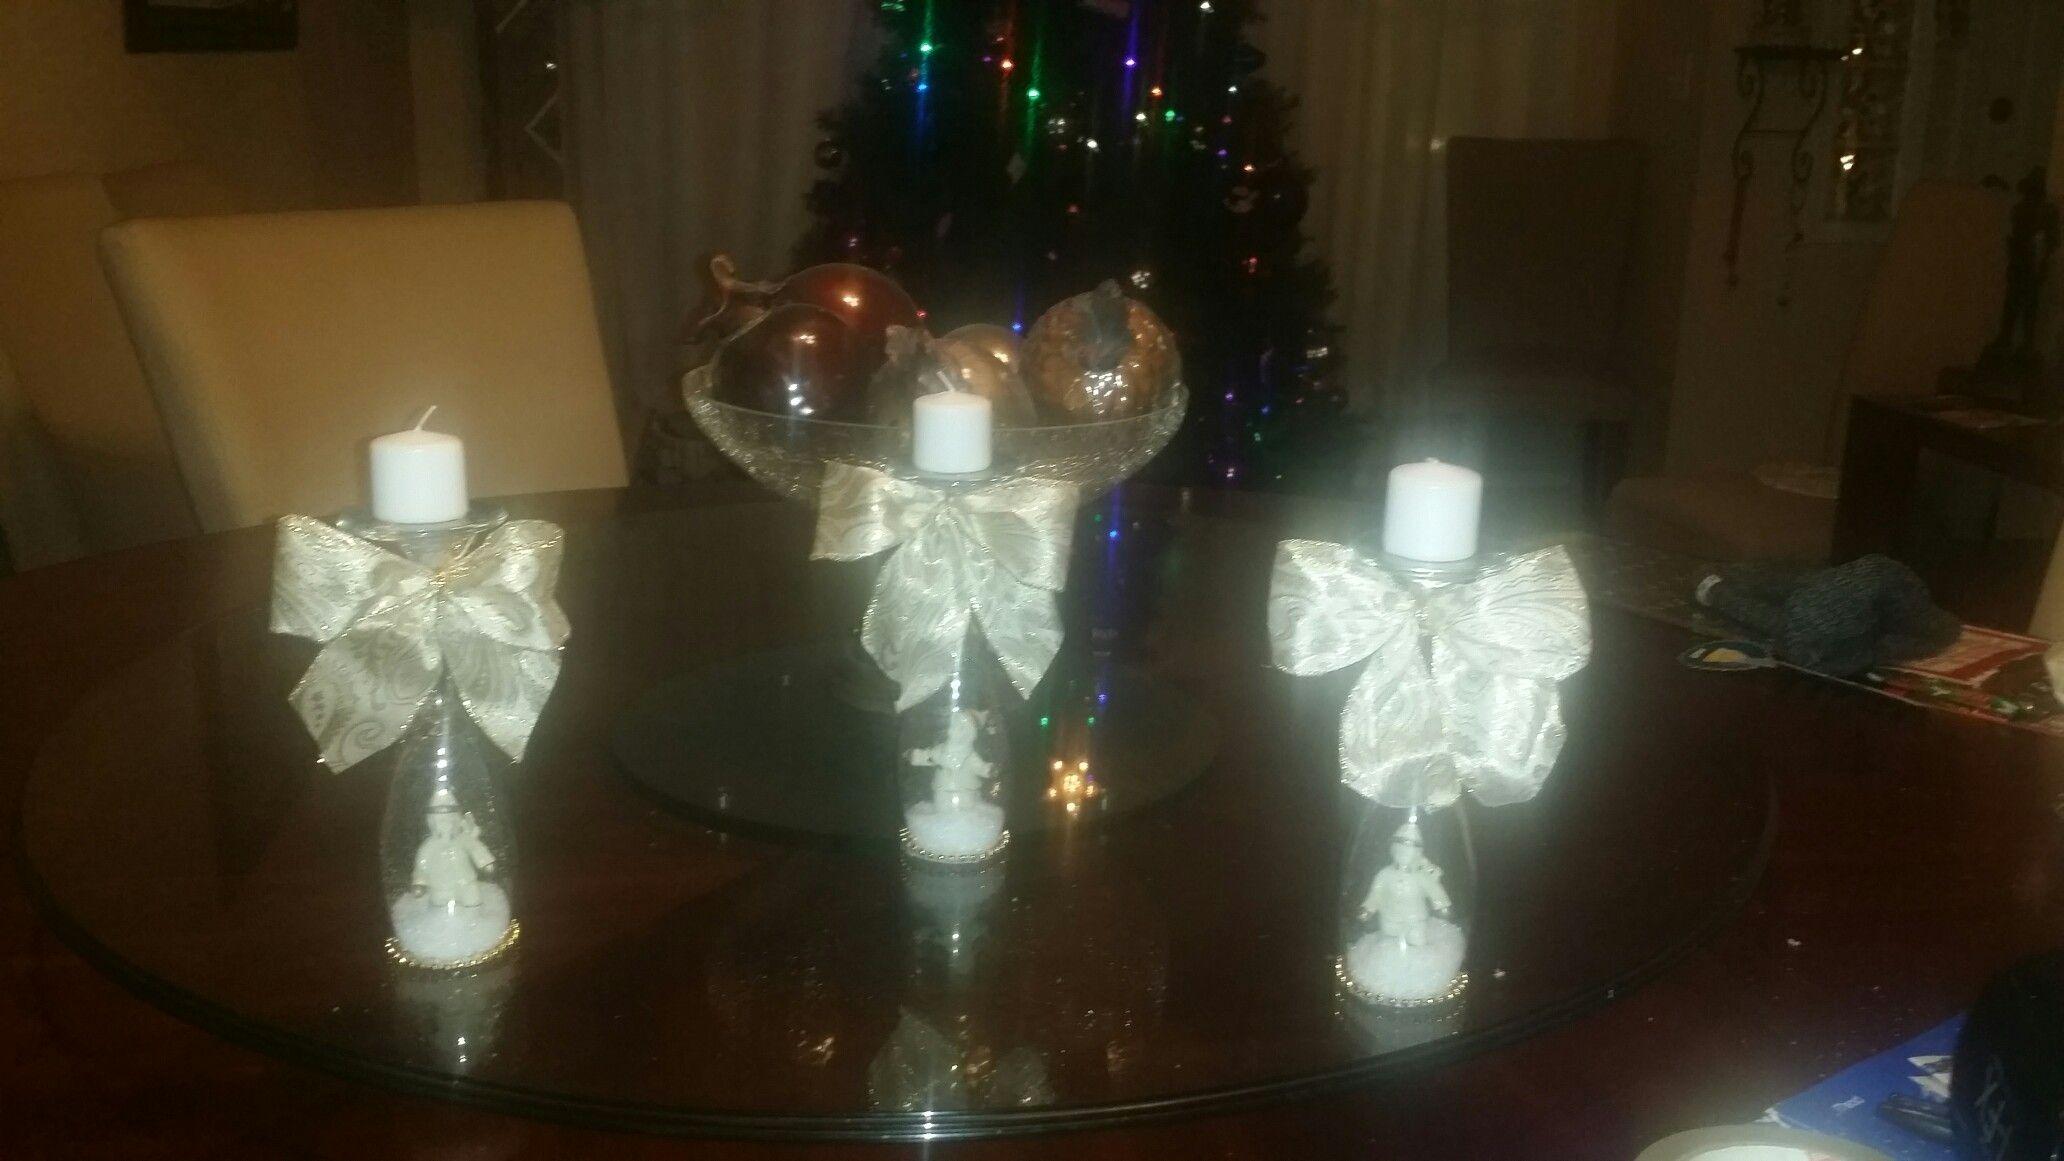 Wine glass with candle n figurine.